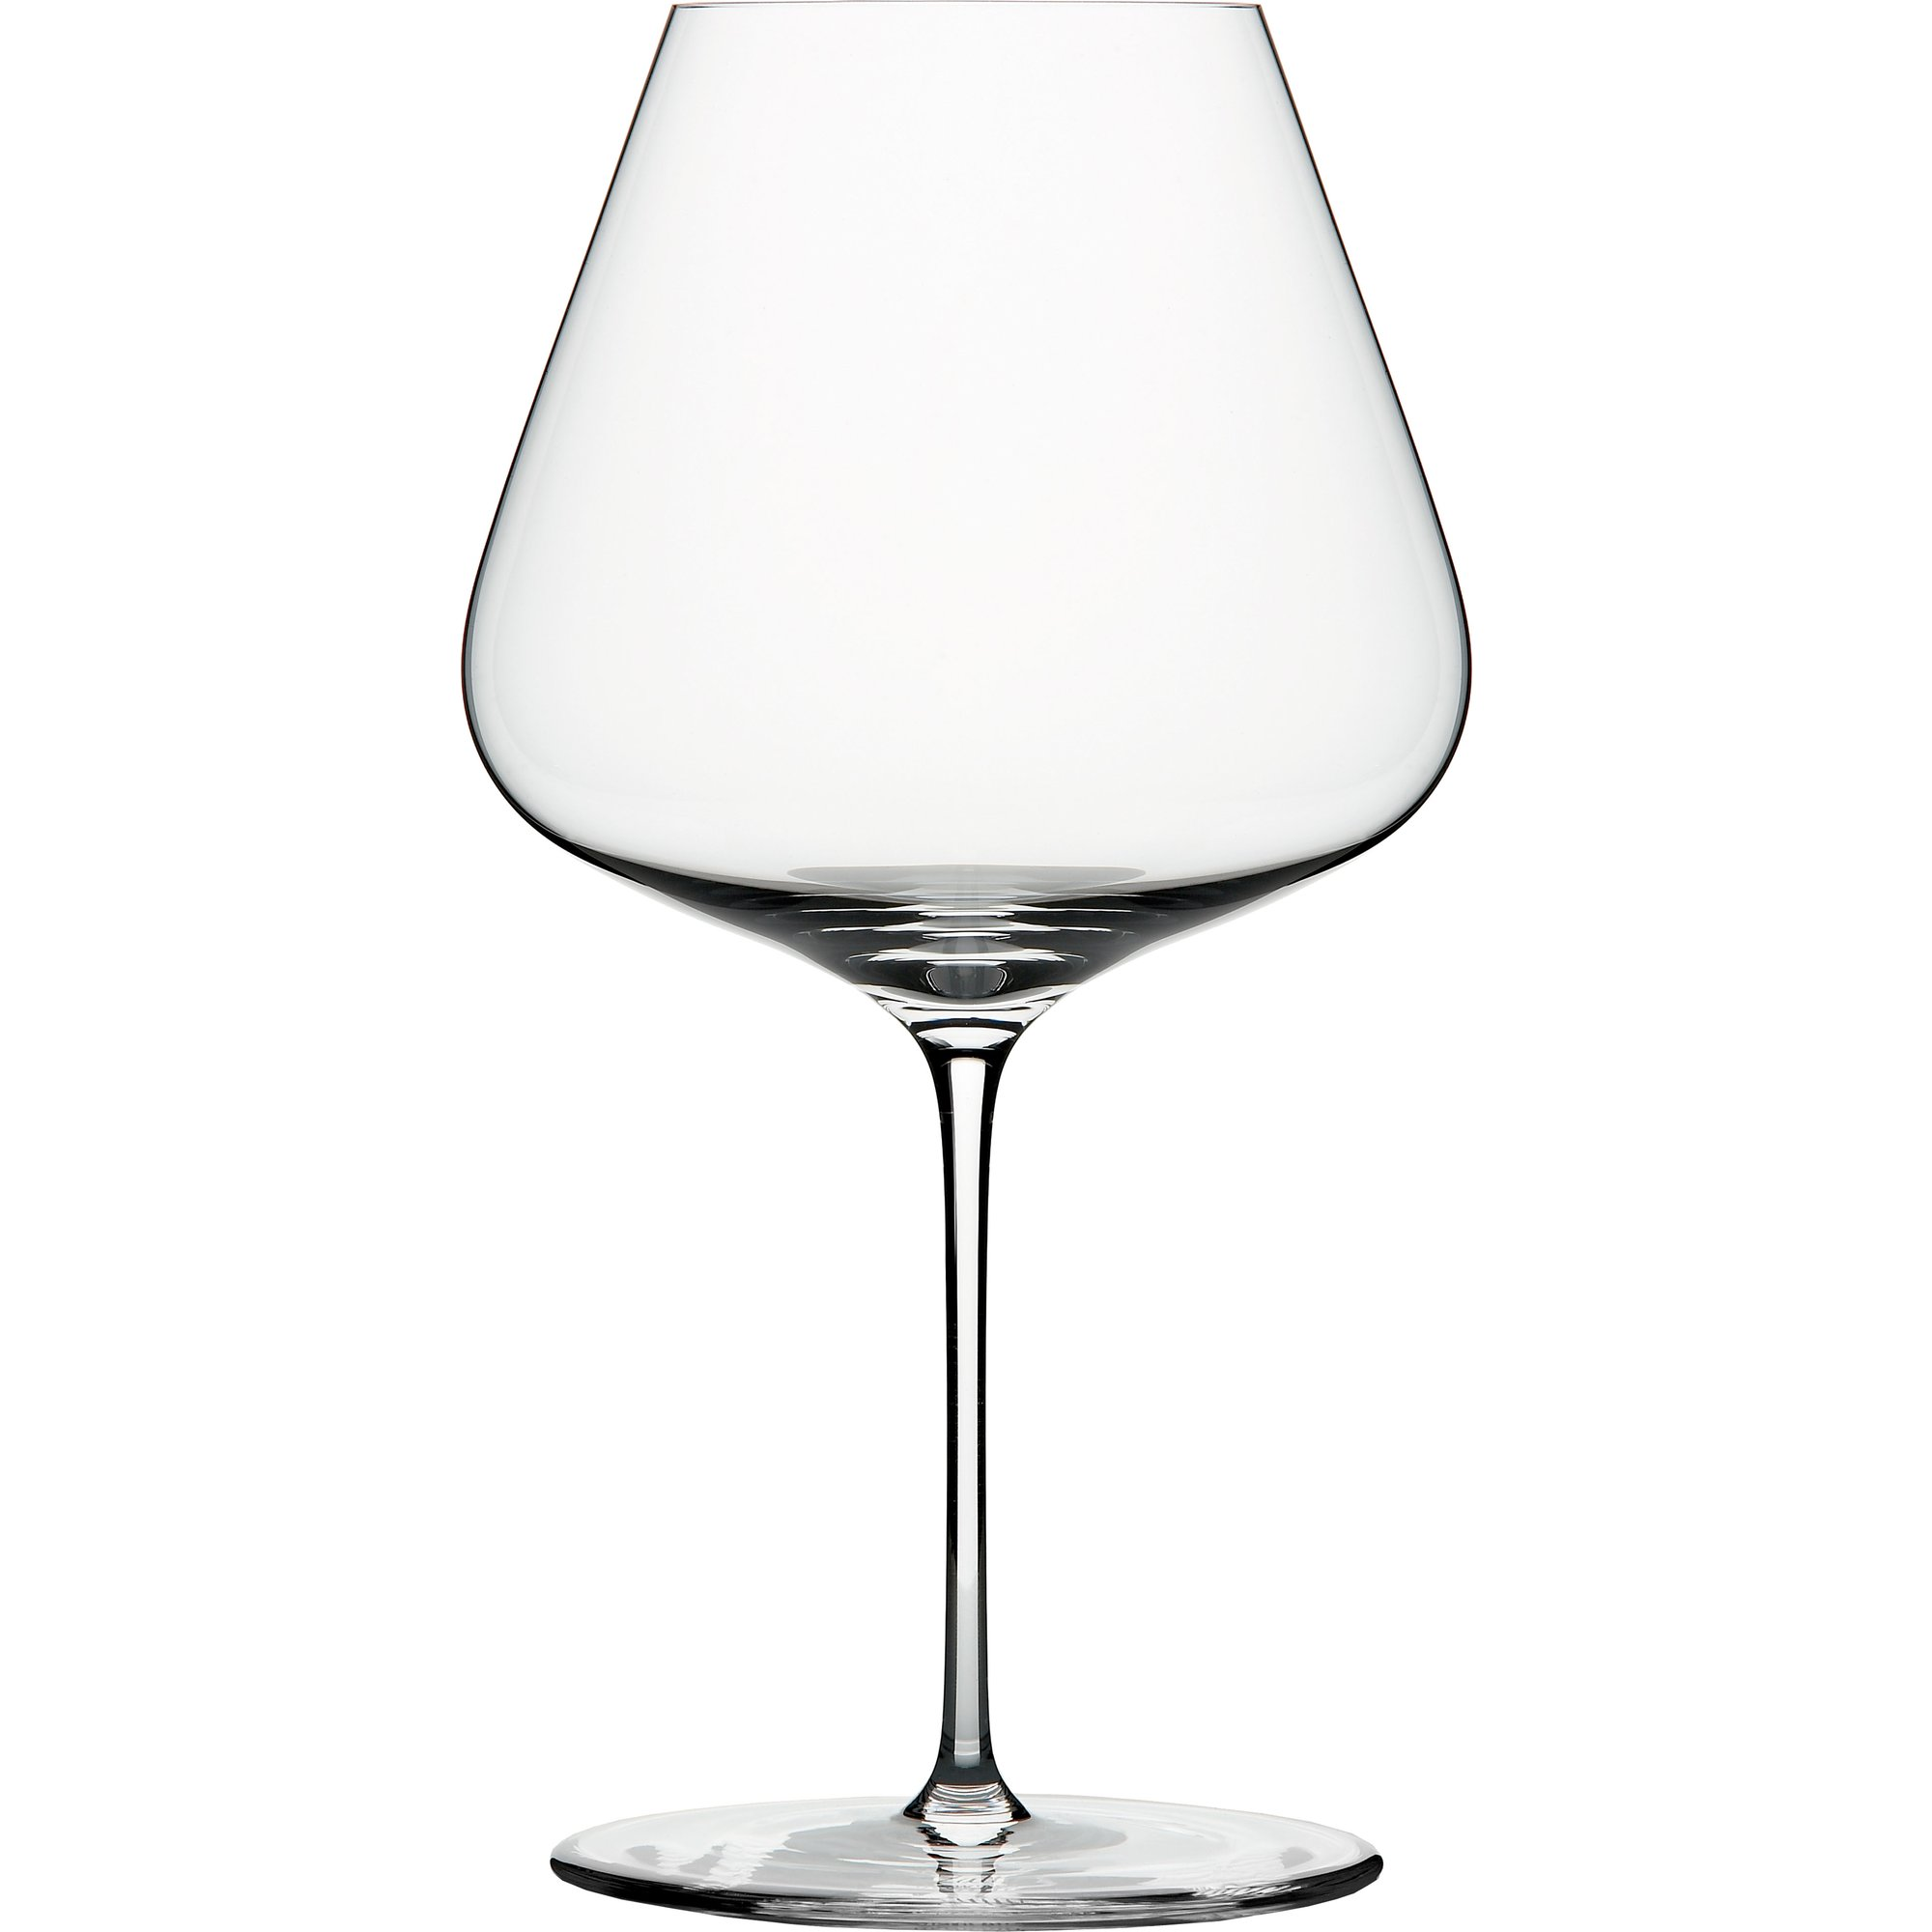 Zalto Bourgogne vinglas 960 ml. 1 st.